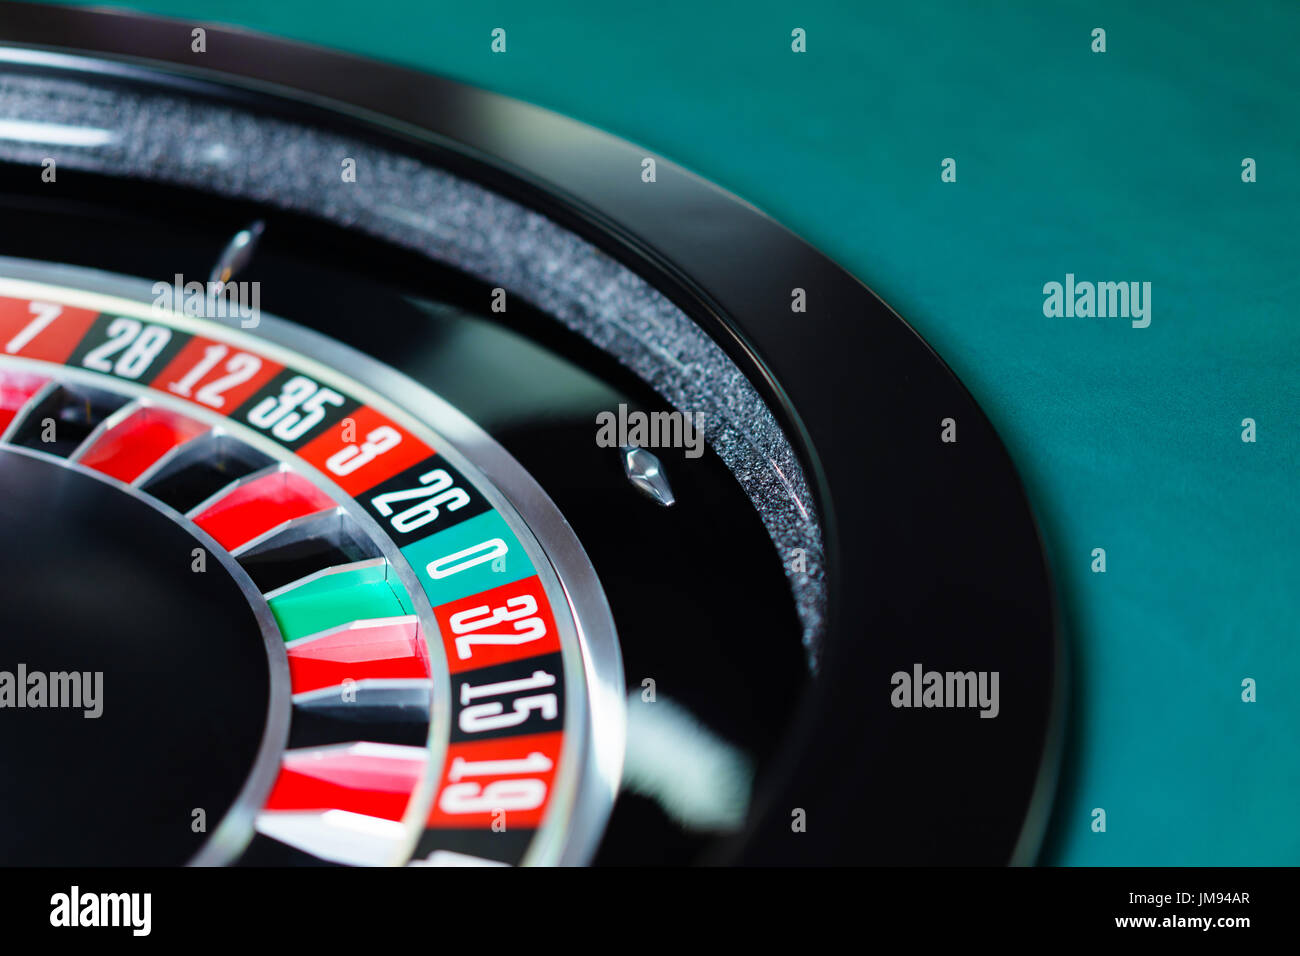 Casino Roulette wheel - Stock Image